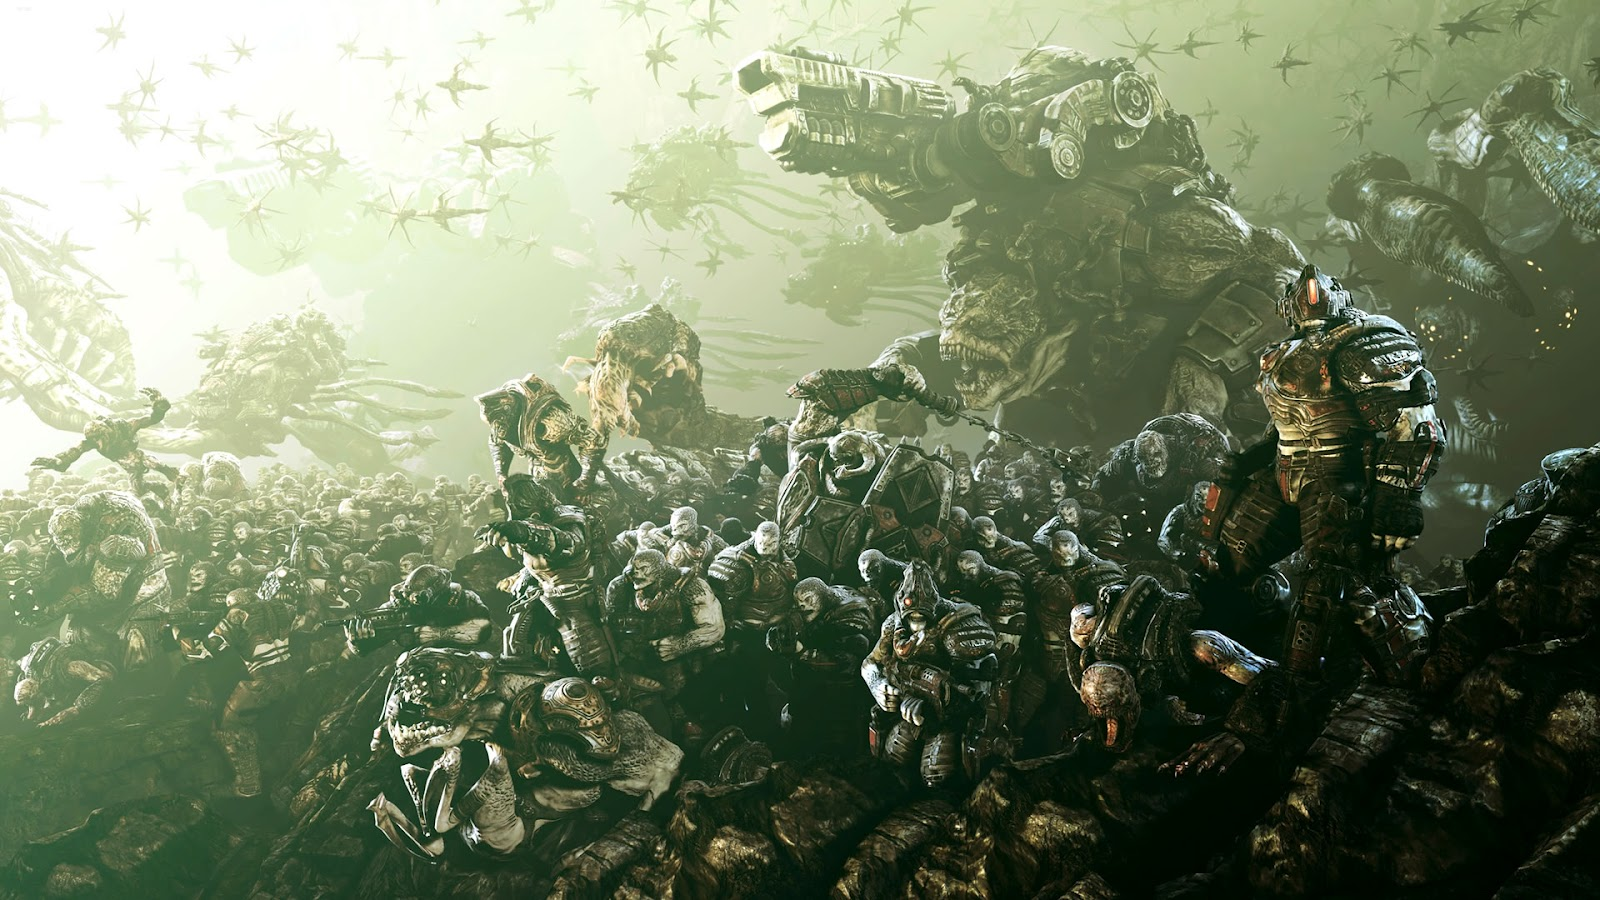 http://2.bp.blogspot.com/-R6N9KkV-9eg/T6sZzxH-pXI/AAAAAAAAAGo/CfkJasV7Oos/s1600/gears-of-war-3-wallpaper.jpg